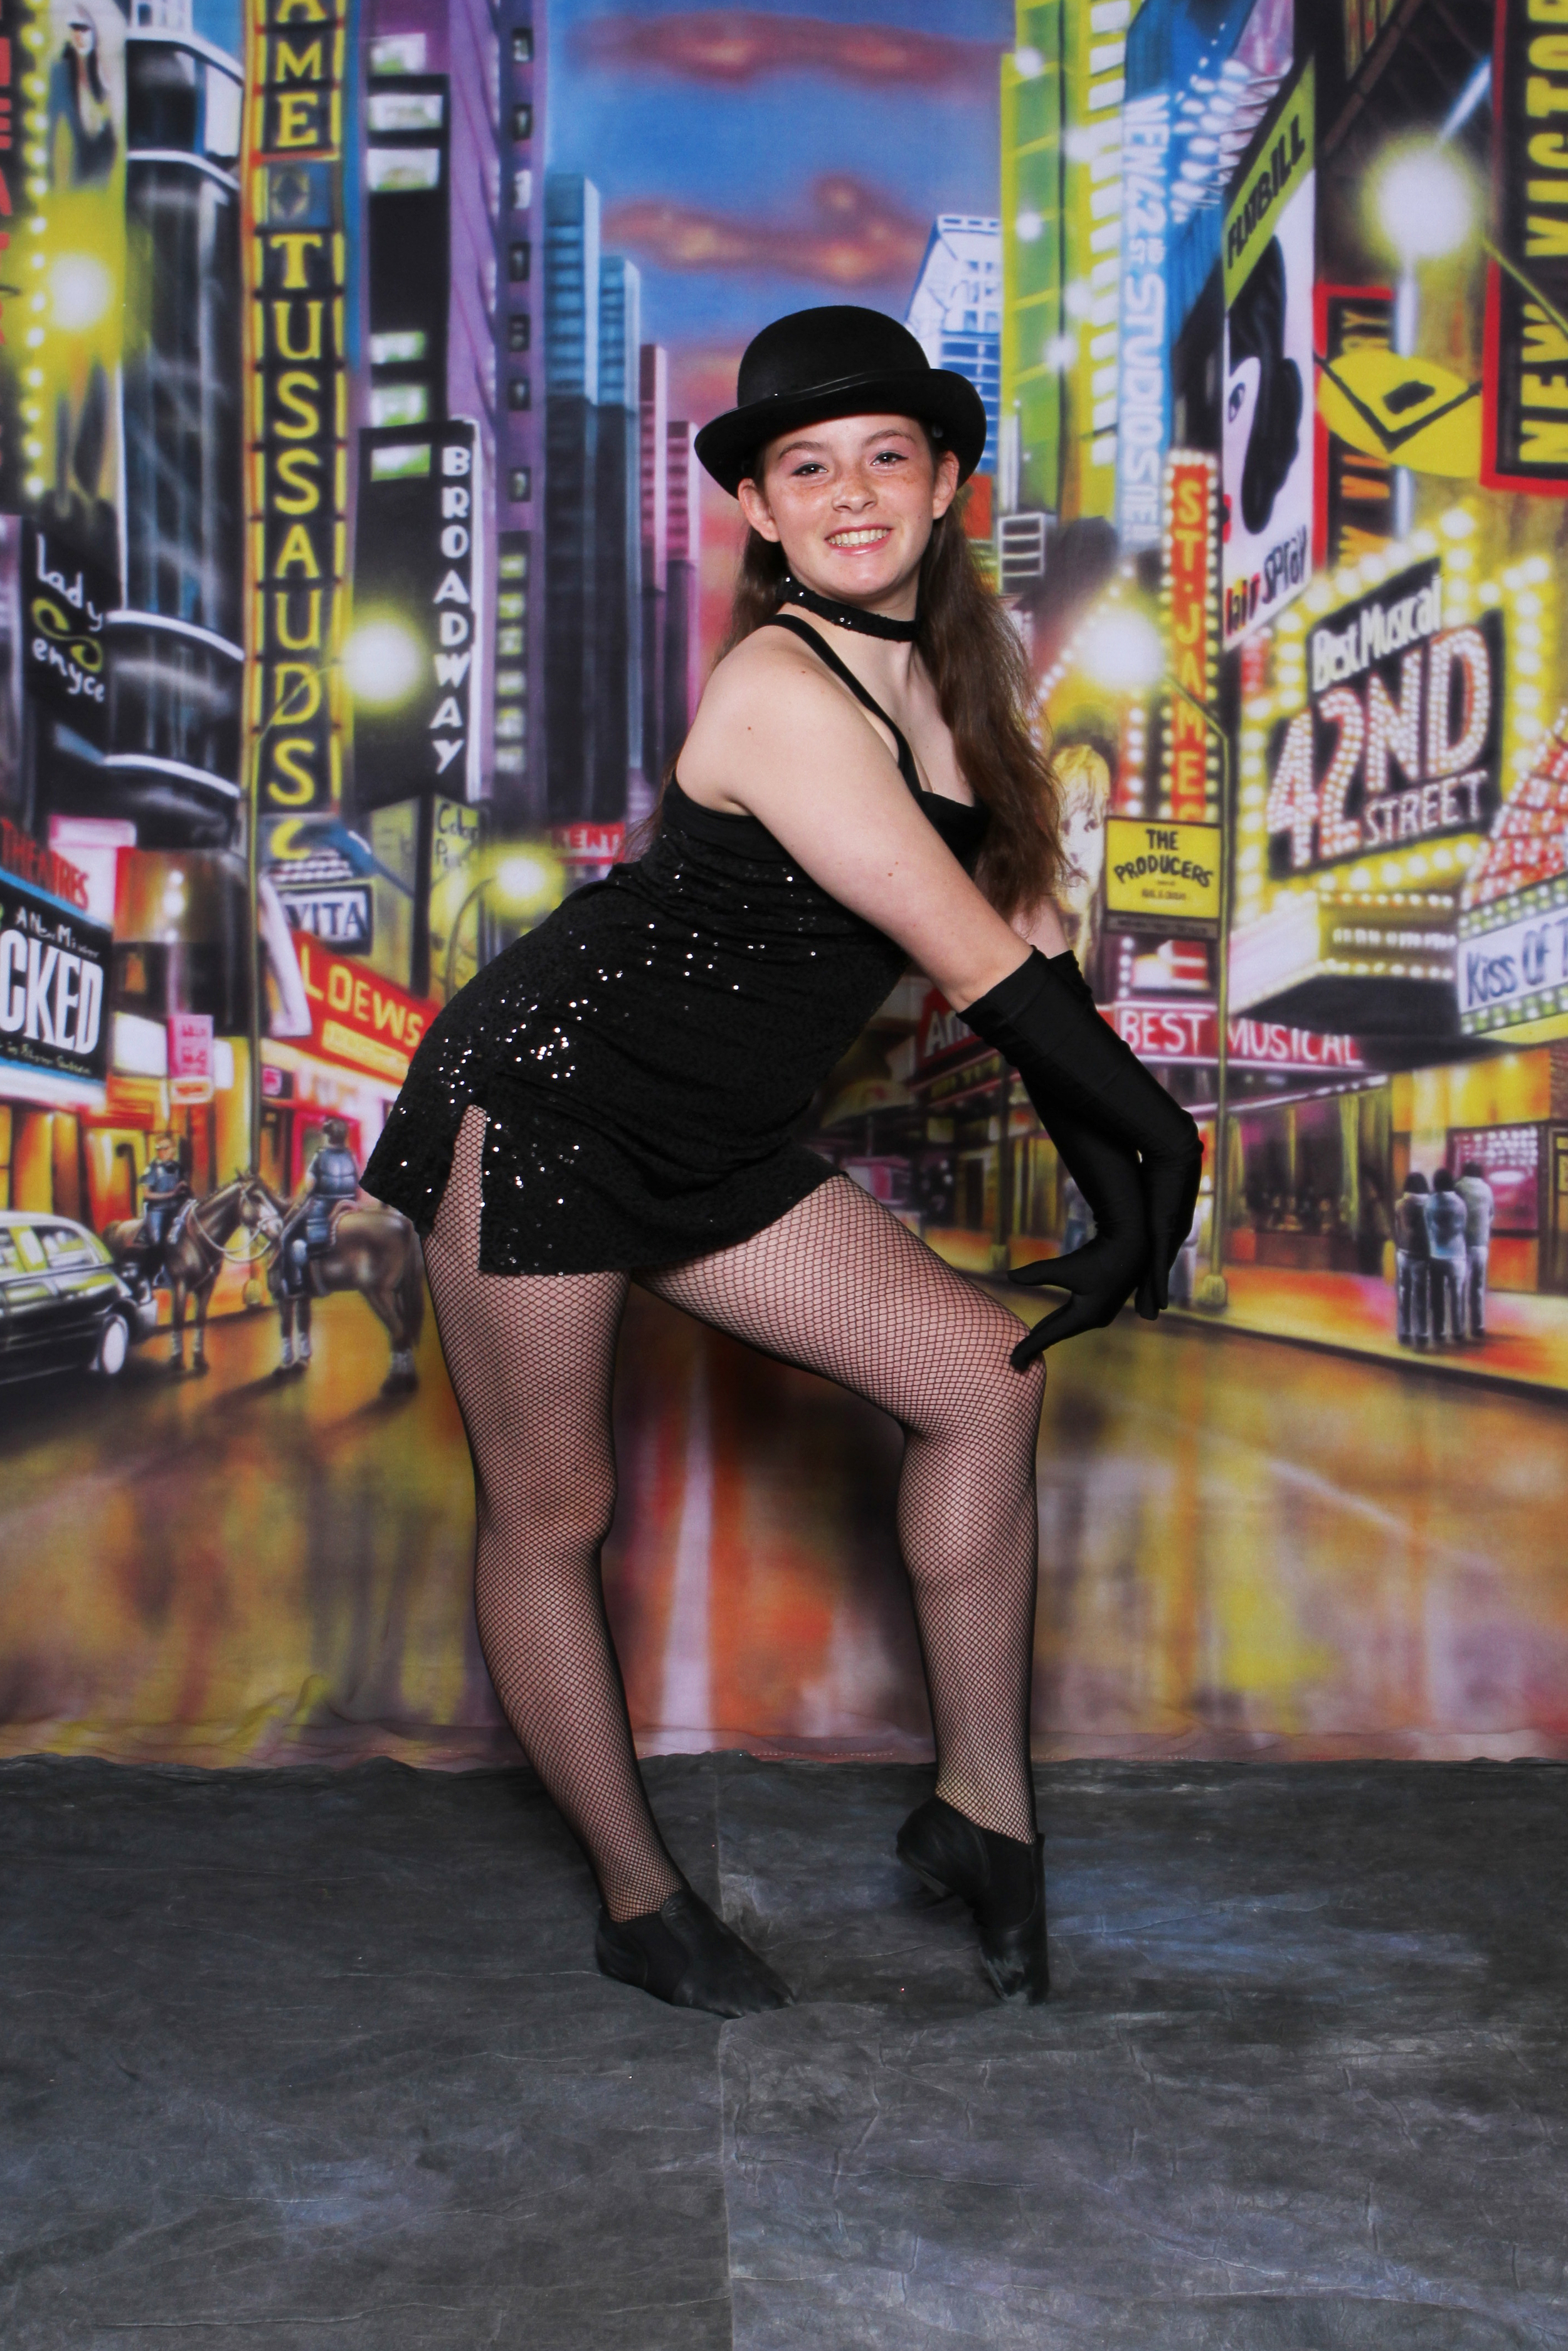 Dancer NYC.JPG